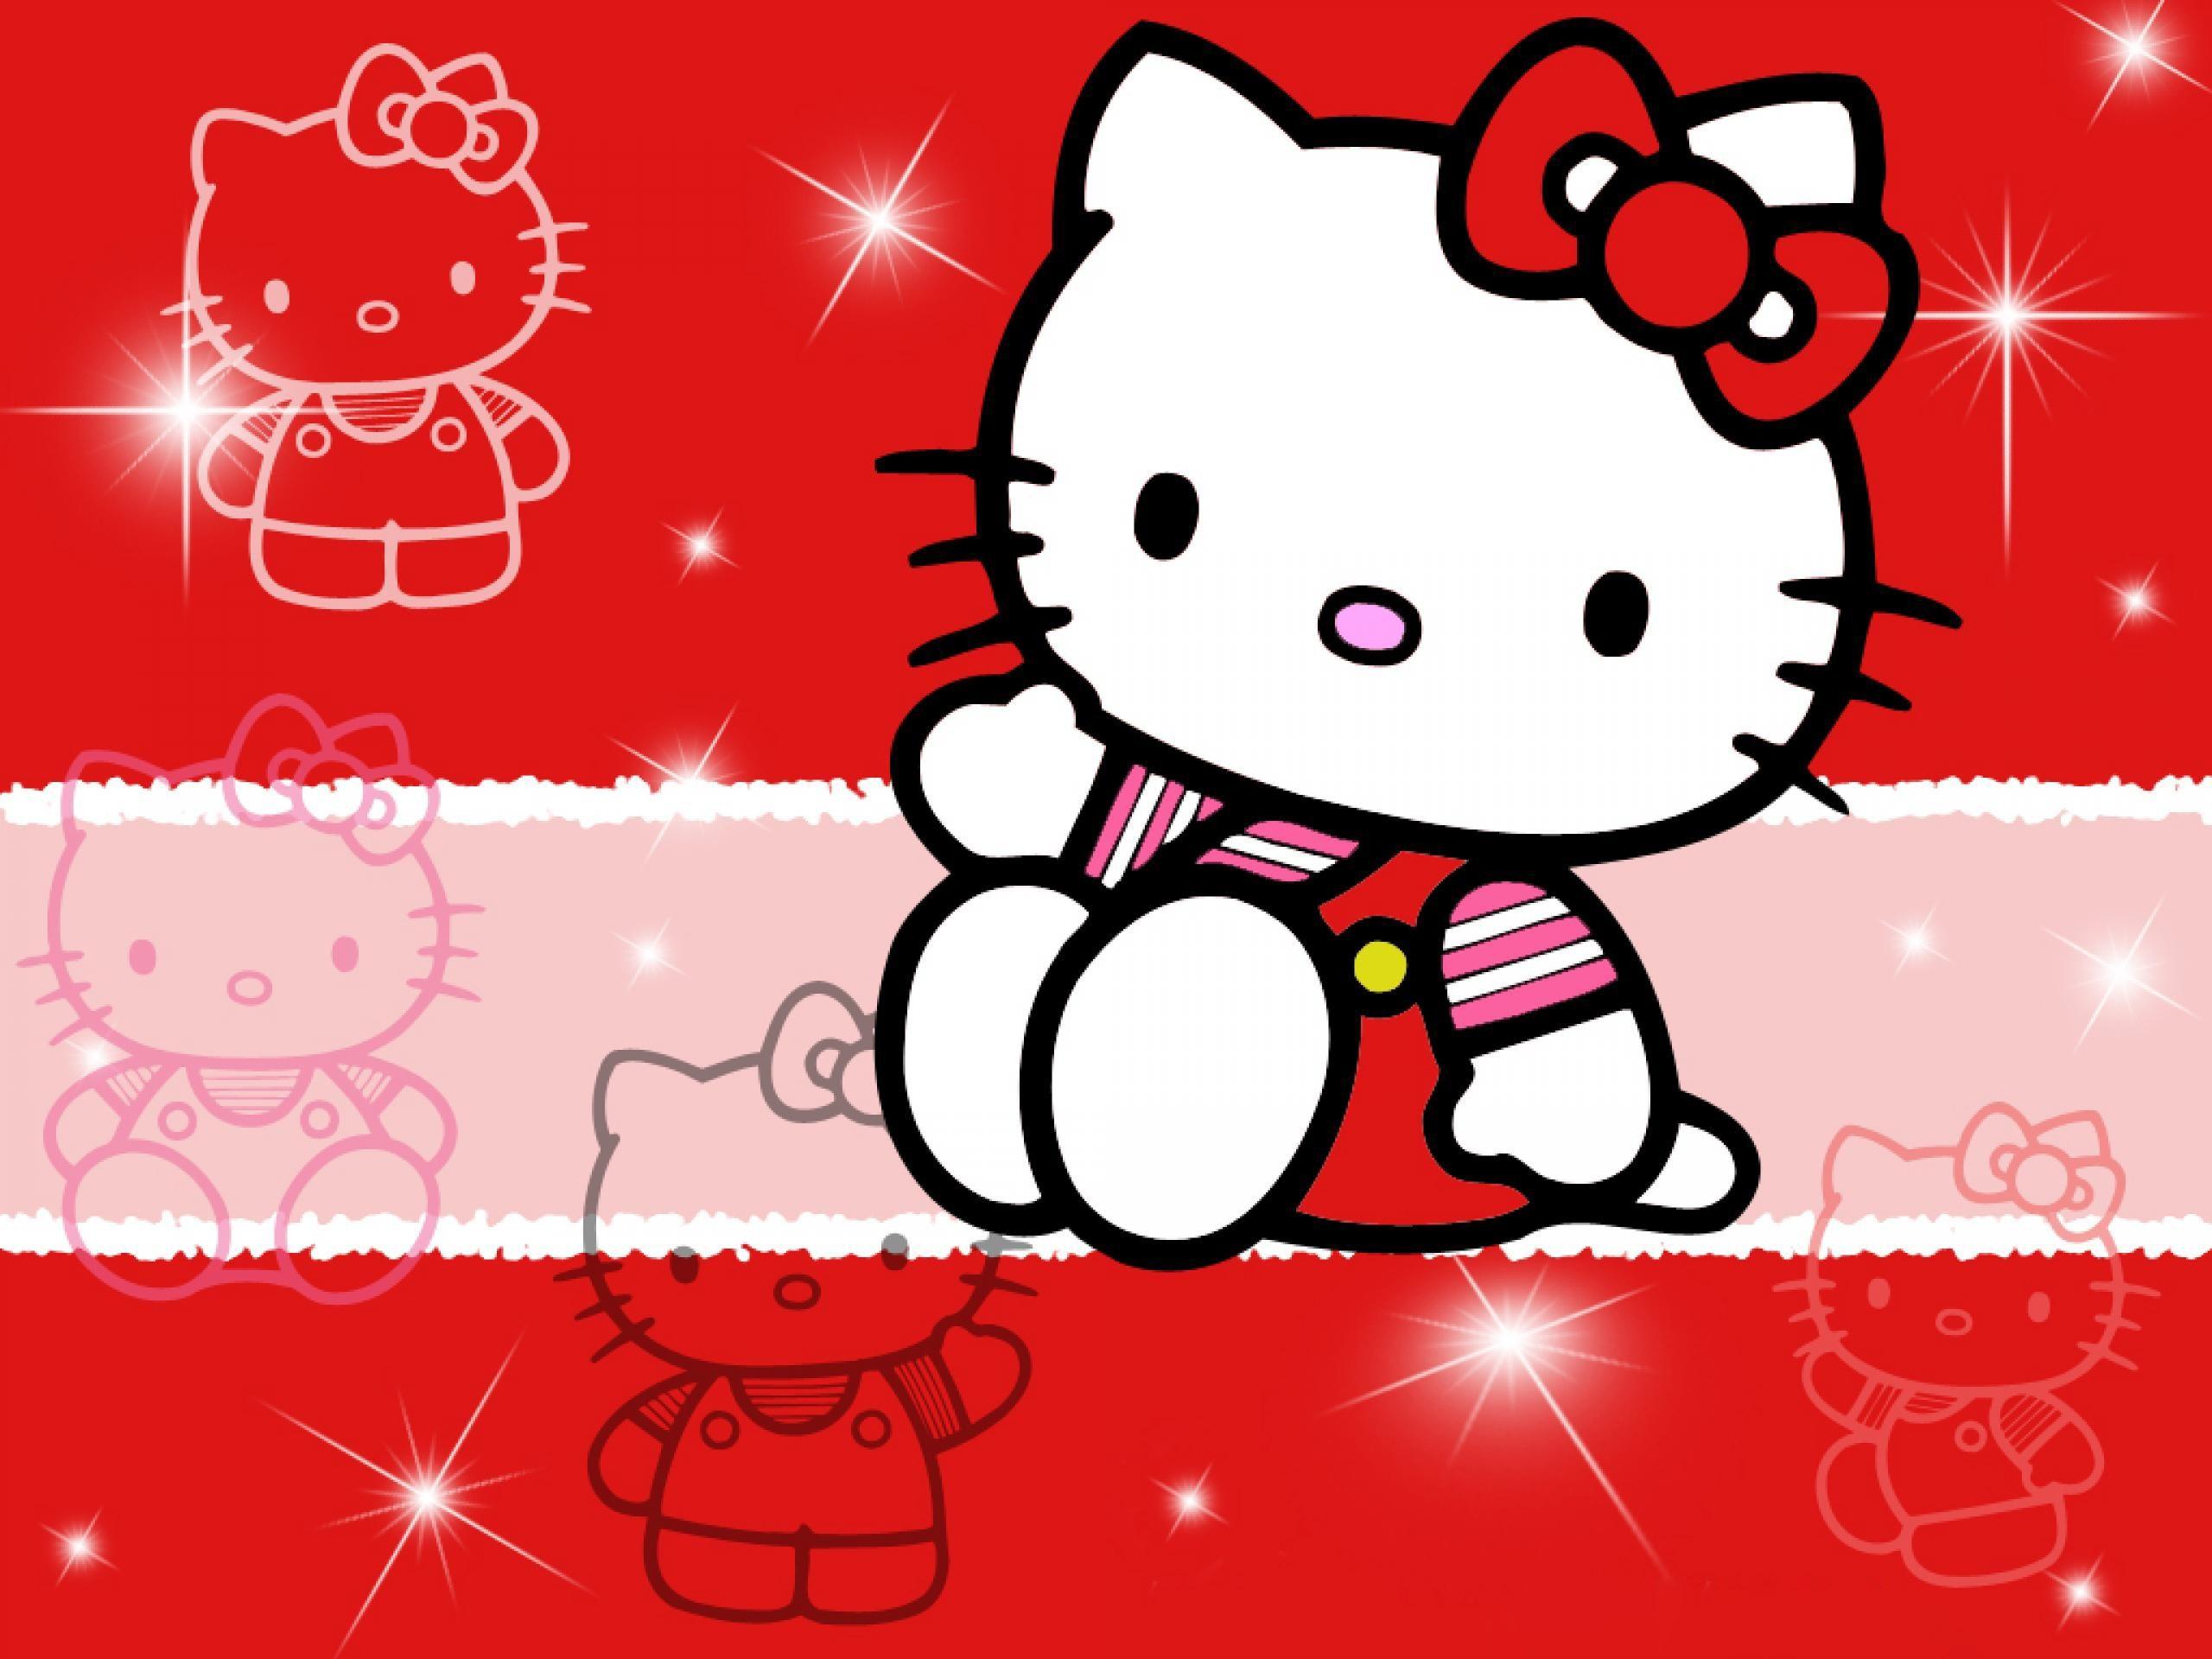 Hello Kitty Wallpaper Â« Funny Â« HD Wallpapers | ololoshka | Pinterest | Hello  kitty images